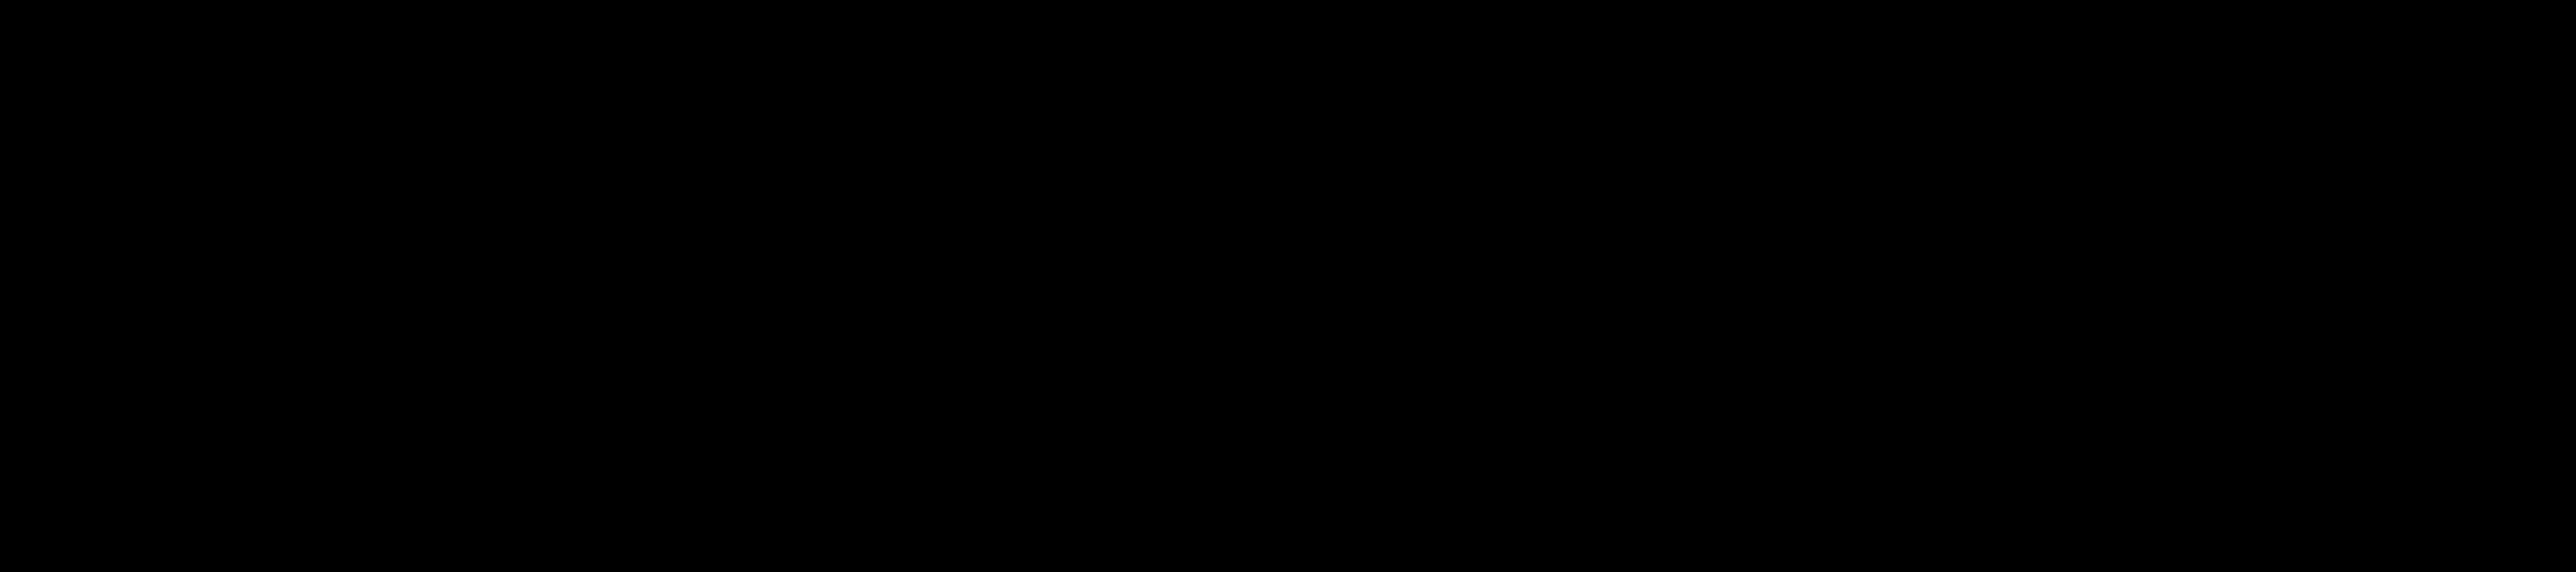 contortionlogo